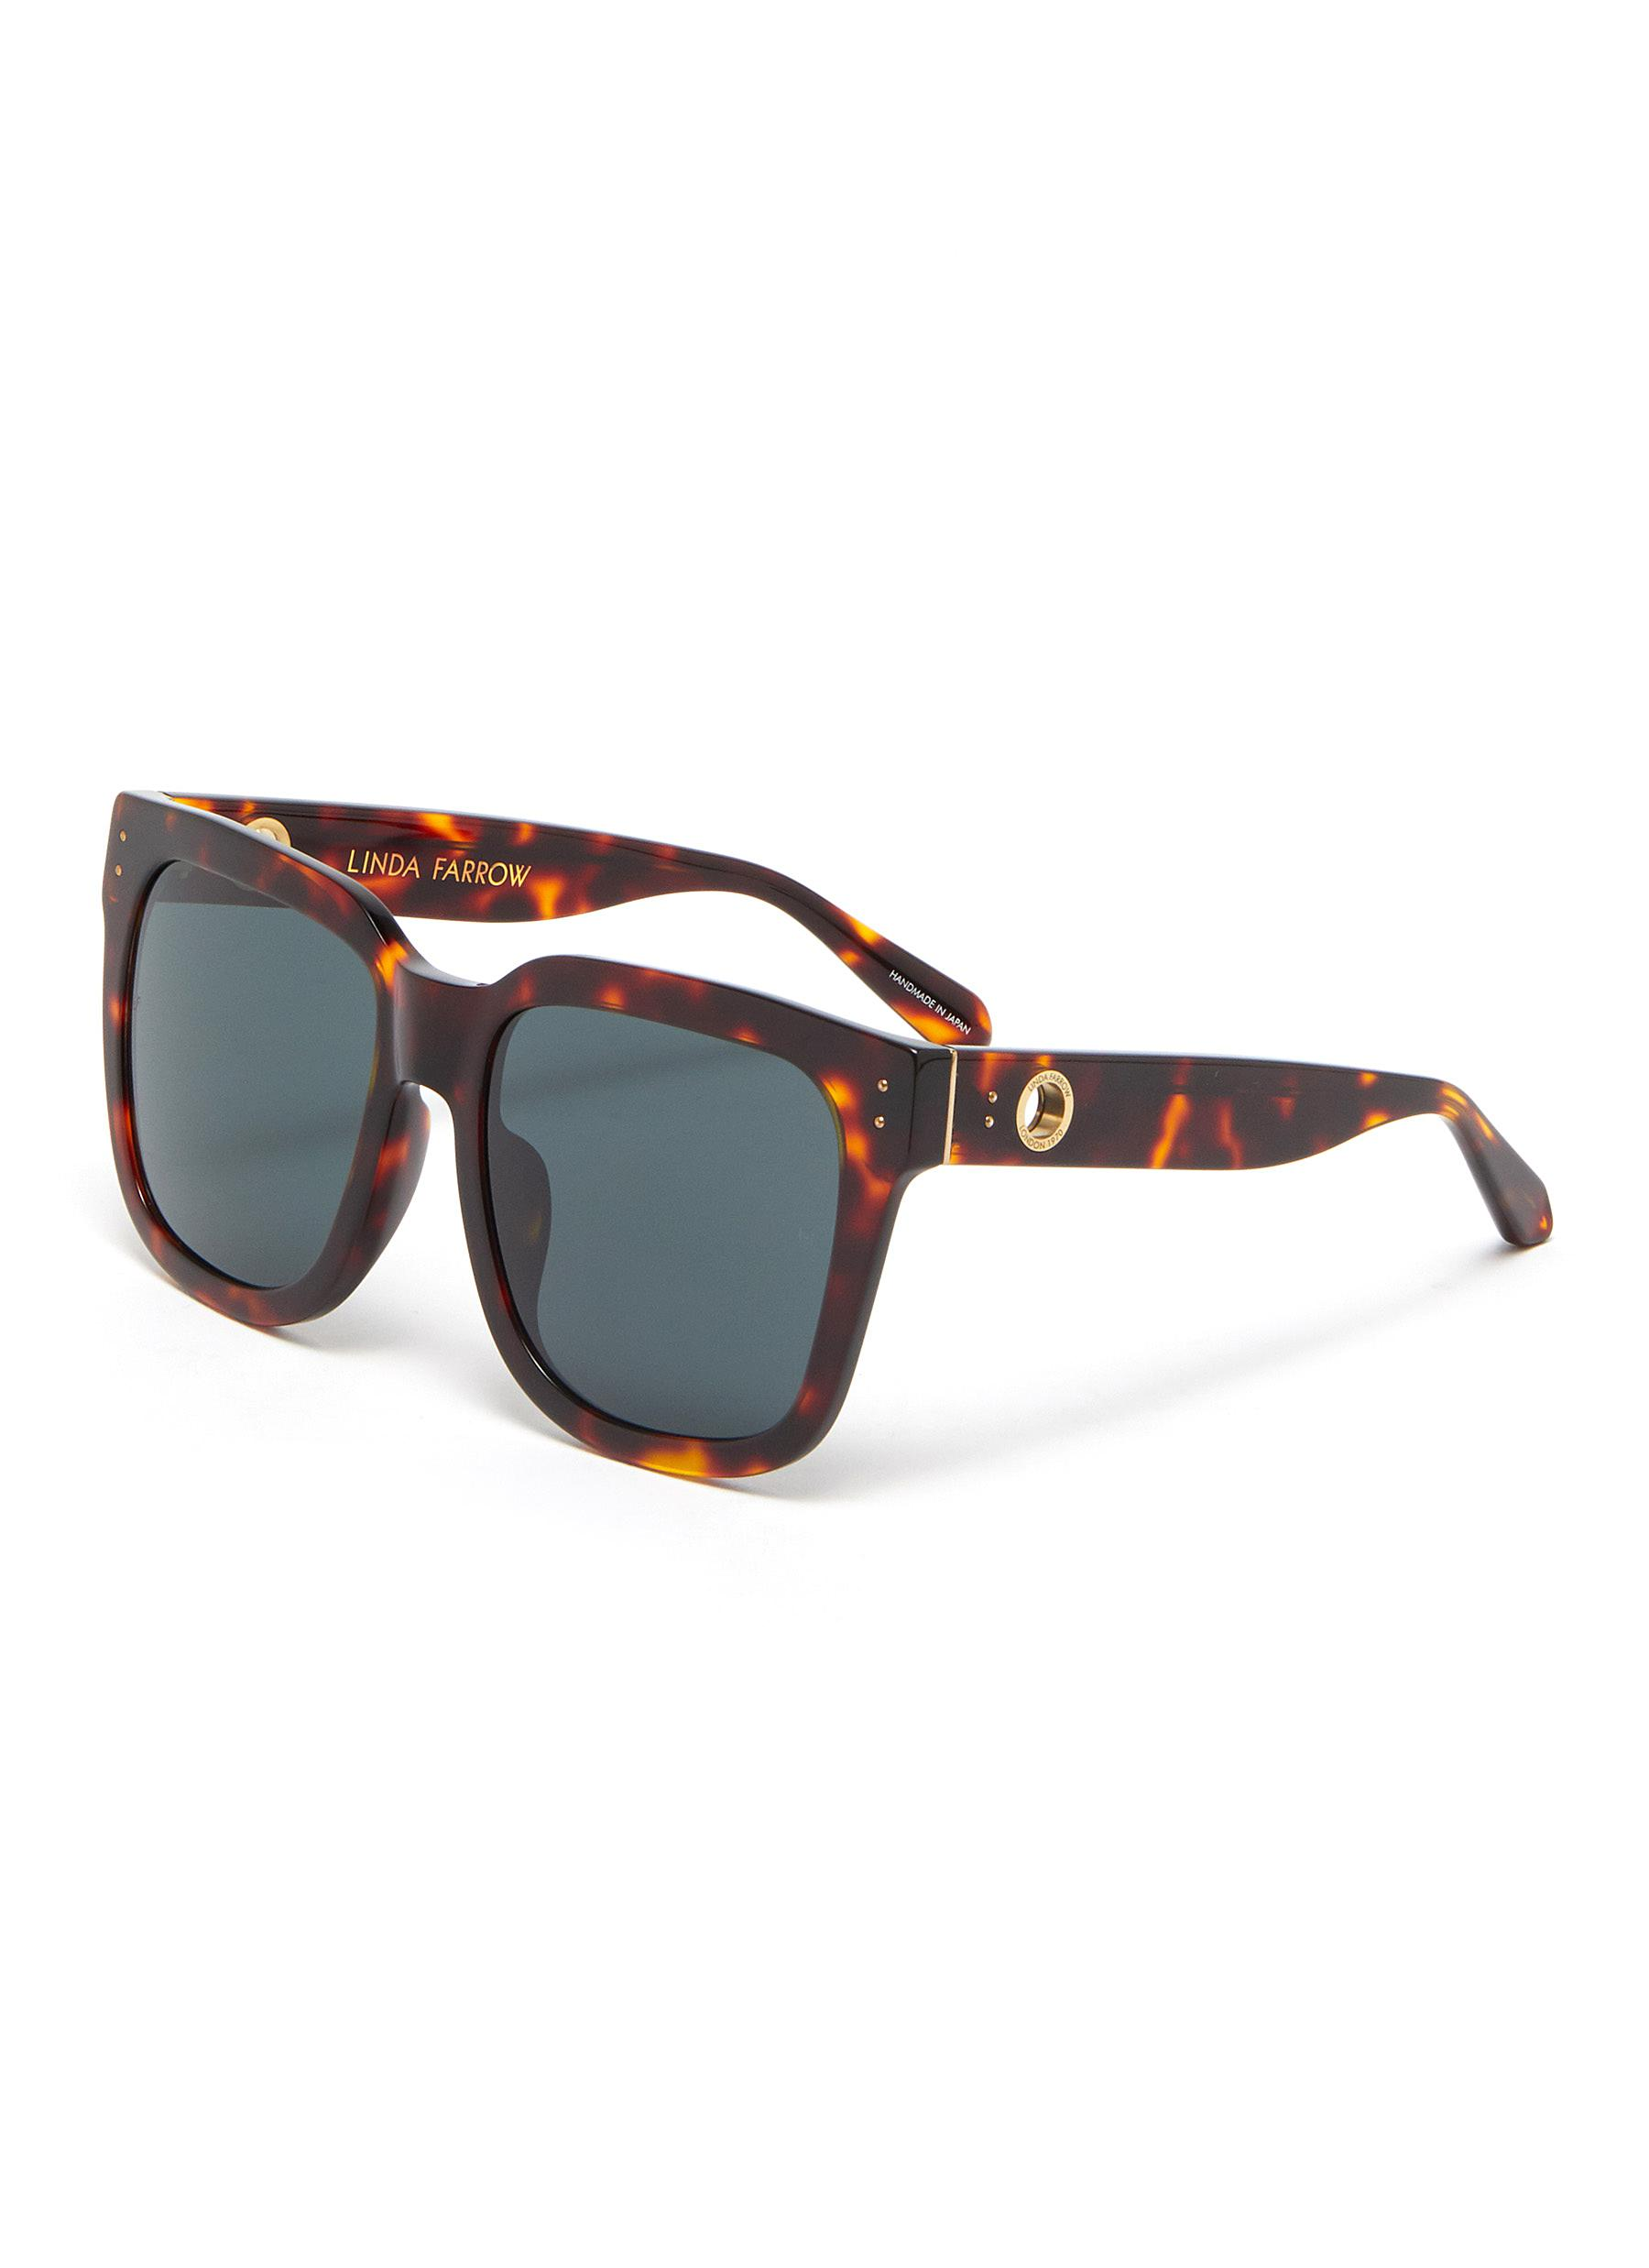 'Freya' Oversized Tortoiseshell Effect Acetate Square Frame Sunglasses